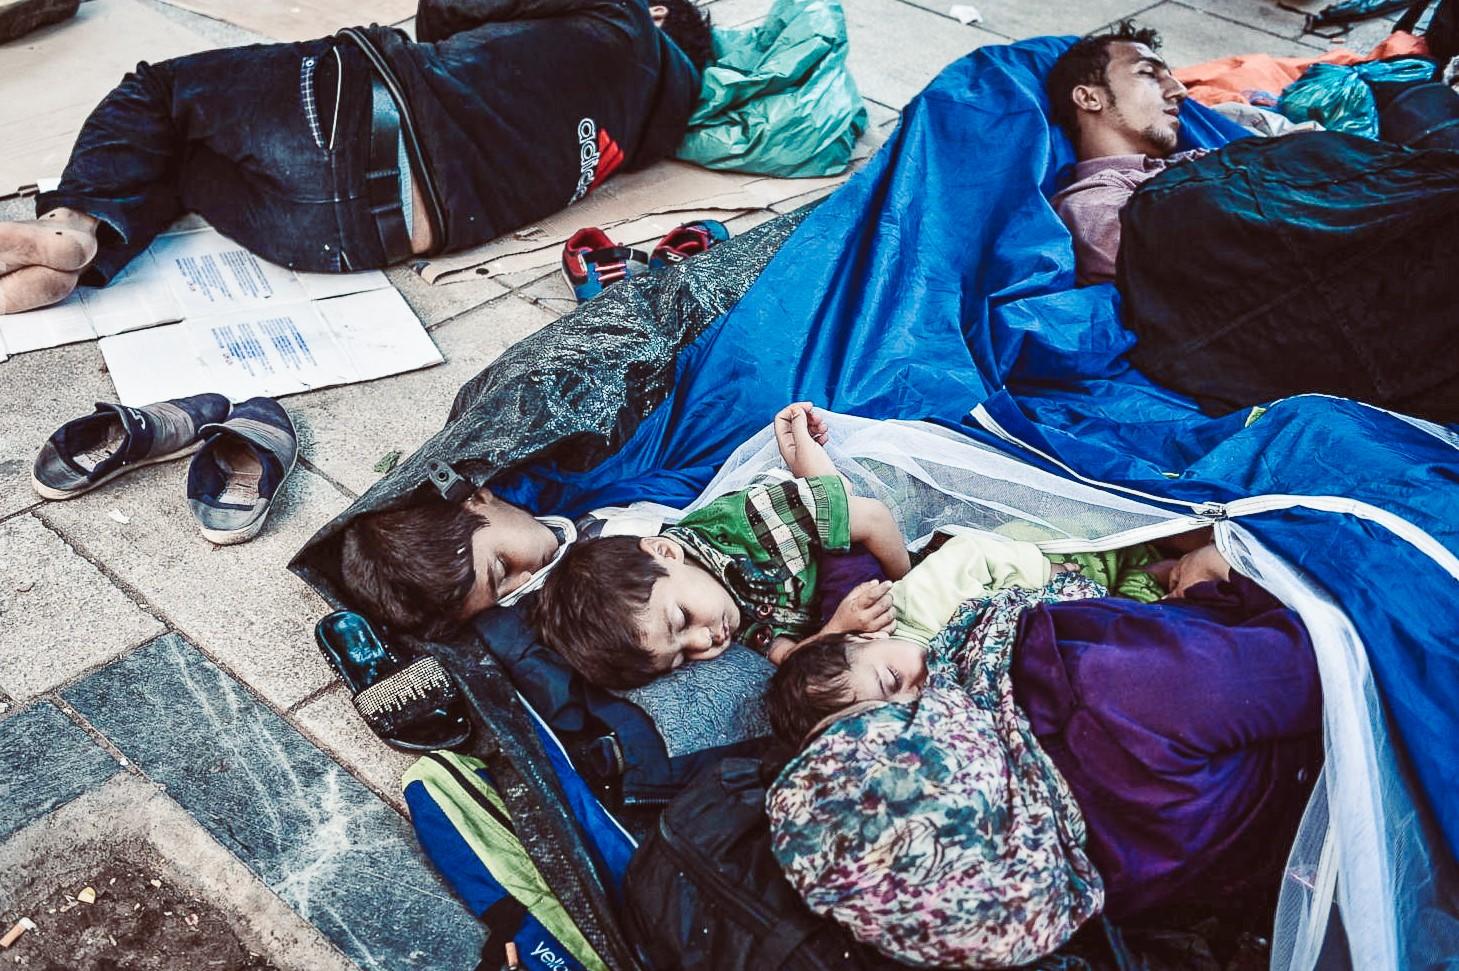 Germany led way on EU human rights protection